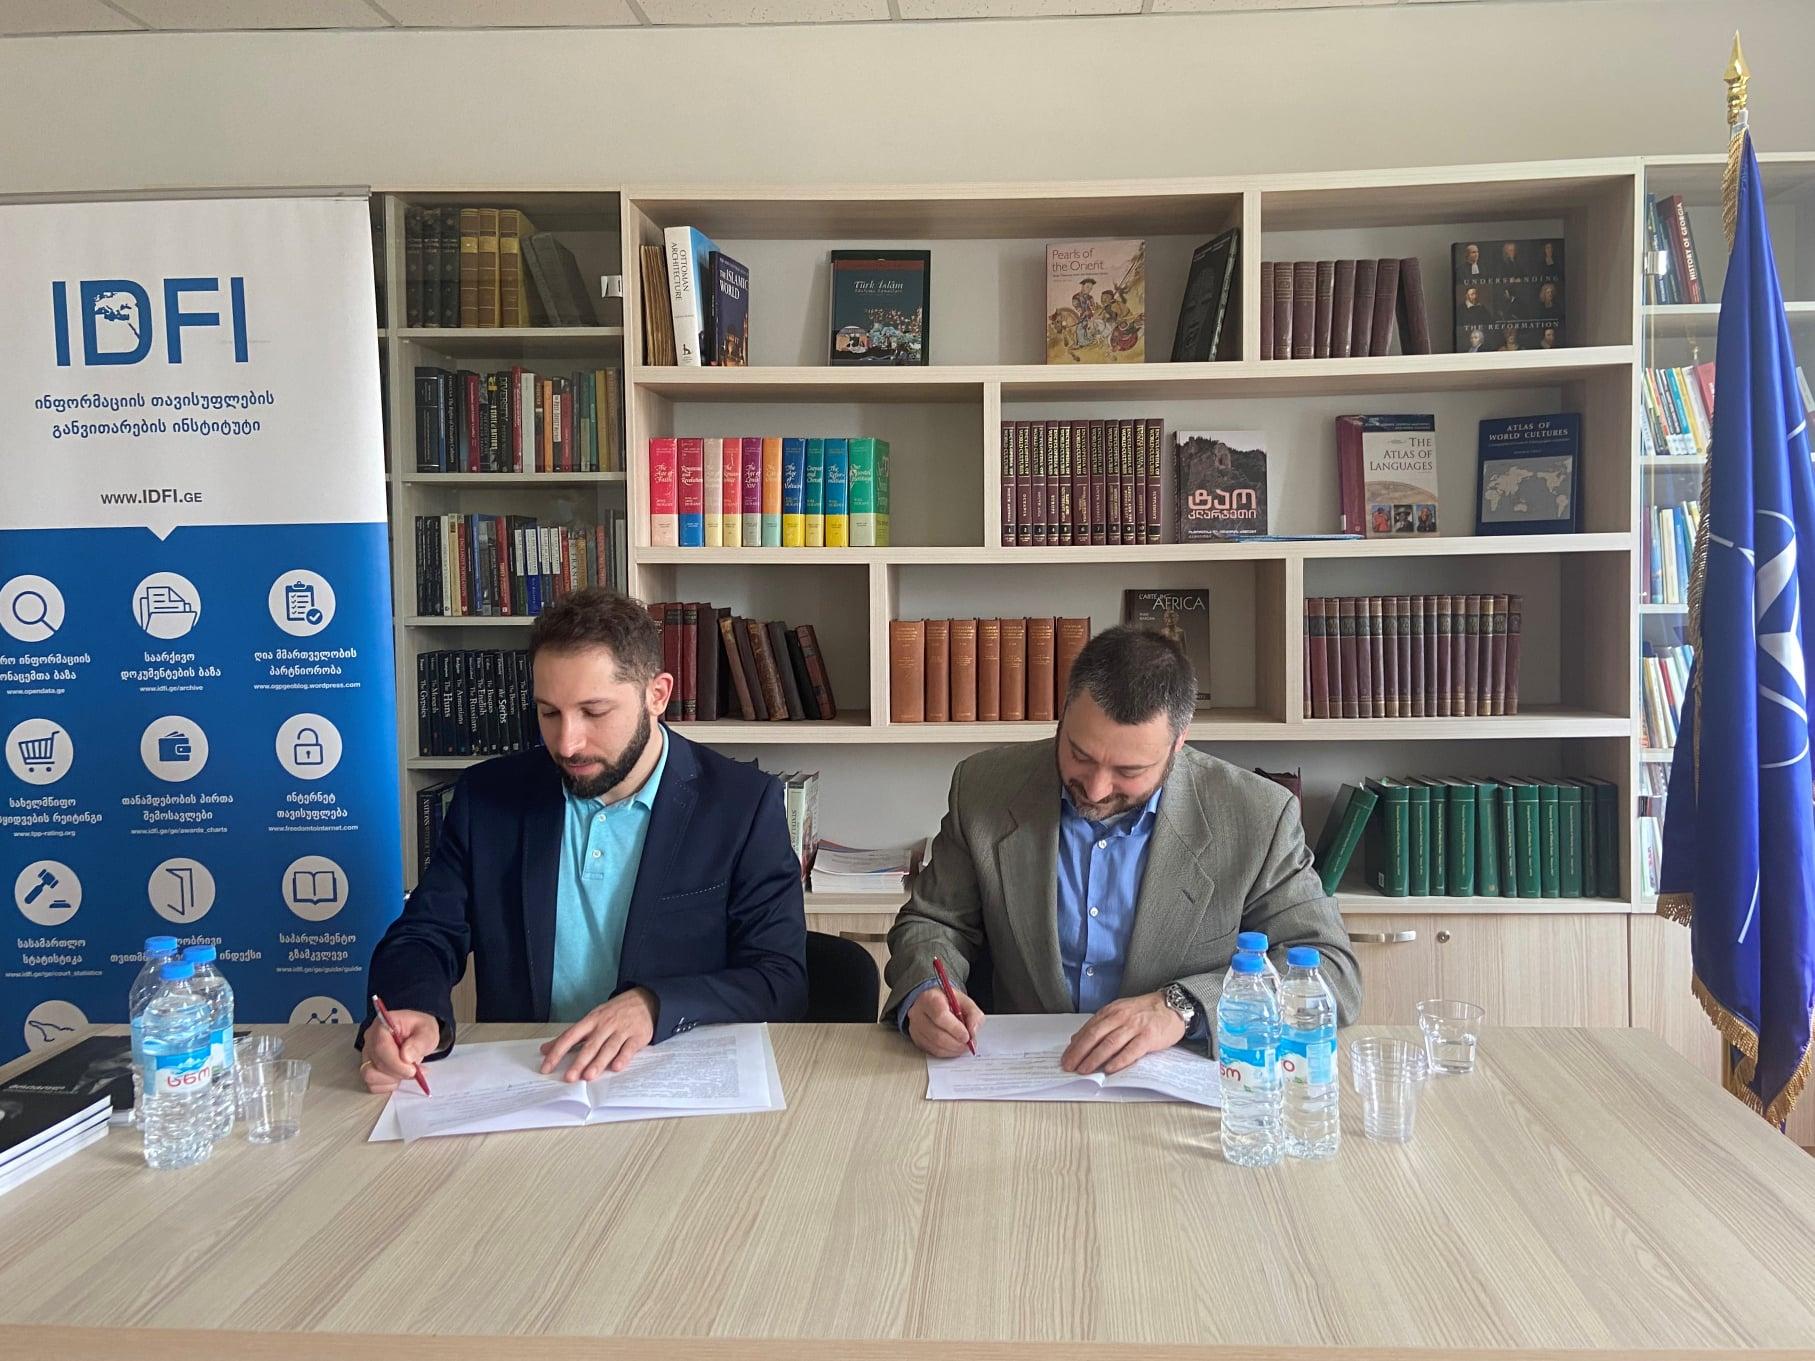 Memorandum of Cooperation was signed between IDFI and the University of Georgia